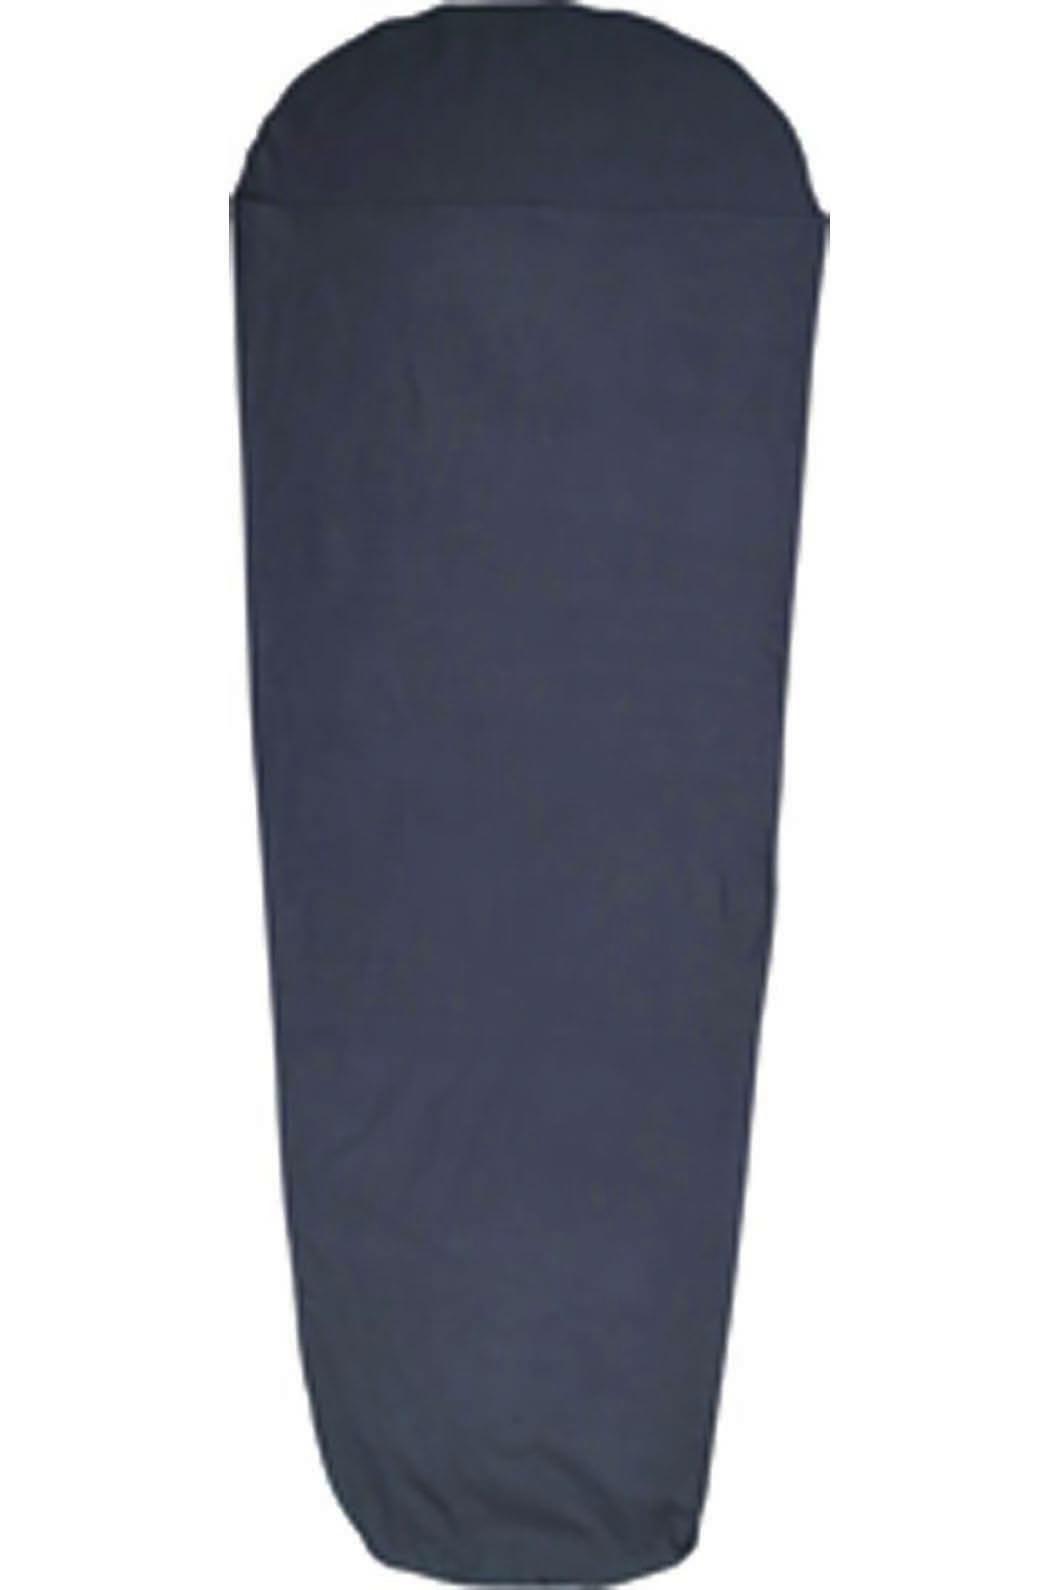 Outrak Rectangular Flannel Sleeping Bag Liner, None, hi-res